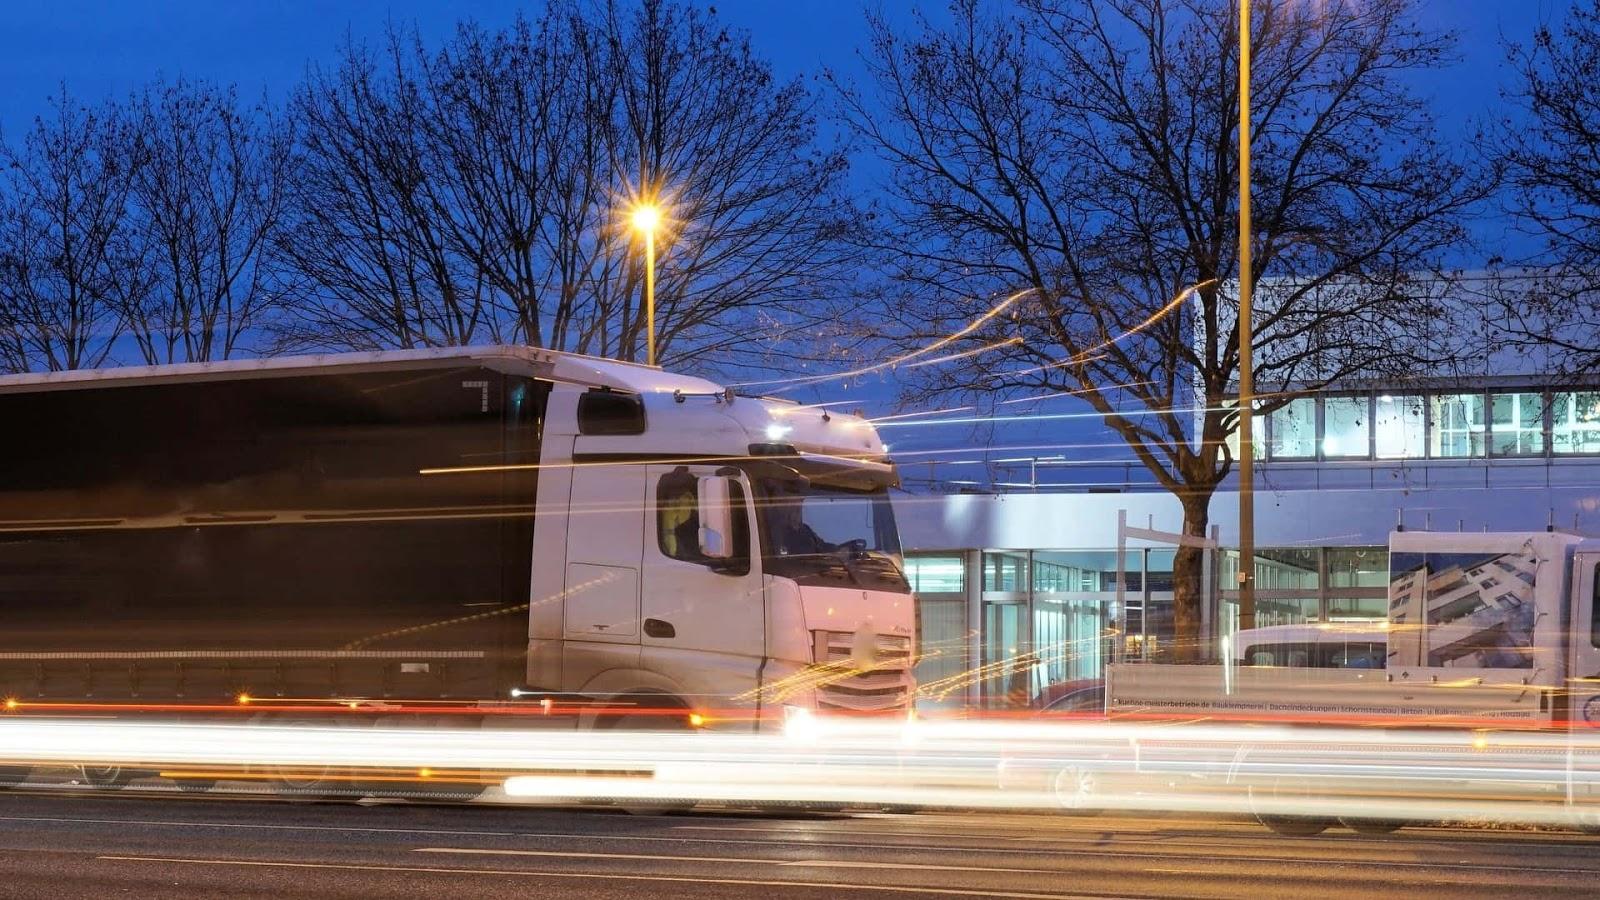 truck driving blur